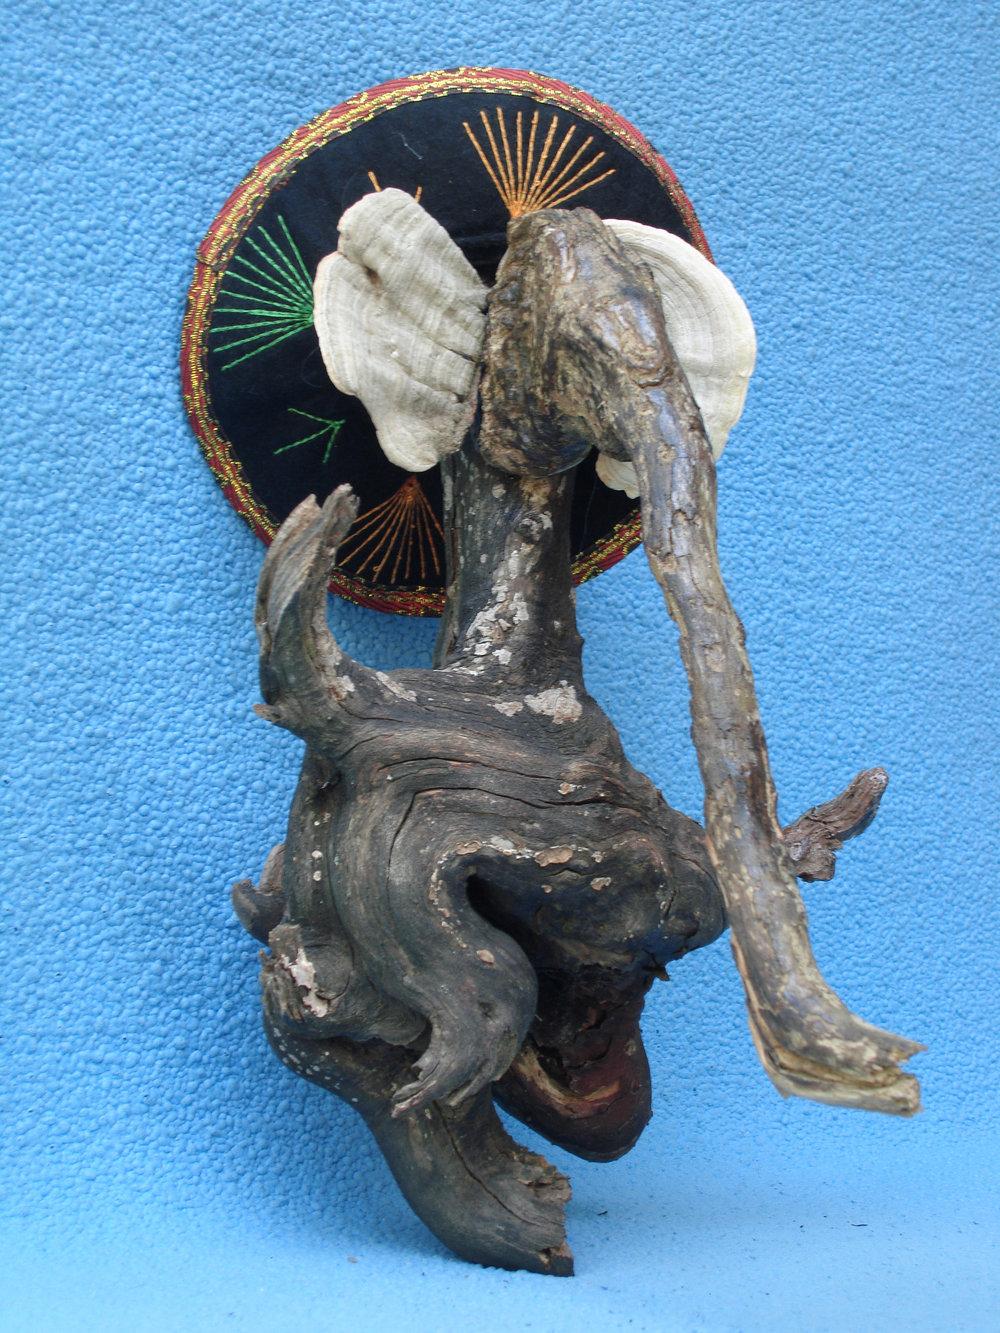 "Elephant, Third Margarita,10"", sticks, mushrooms"